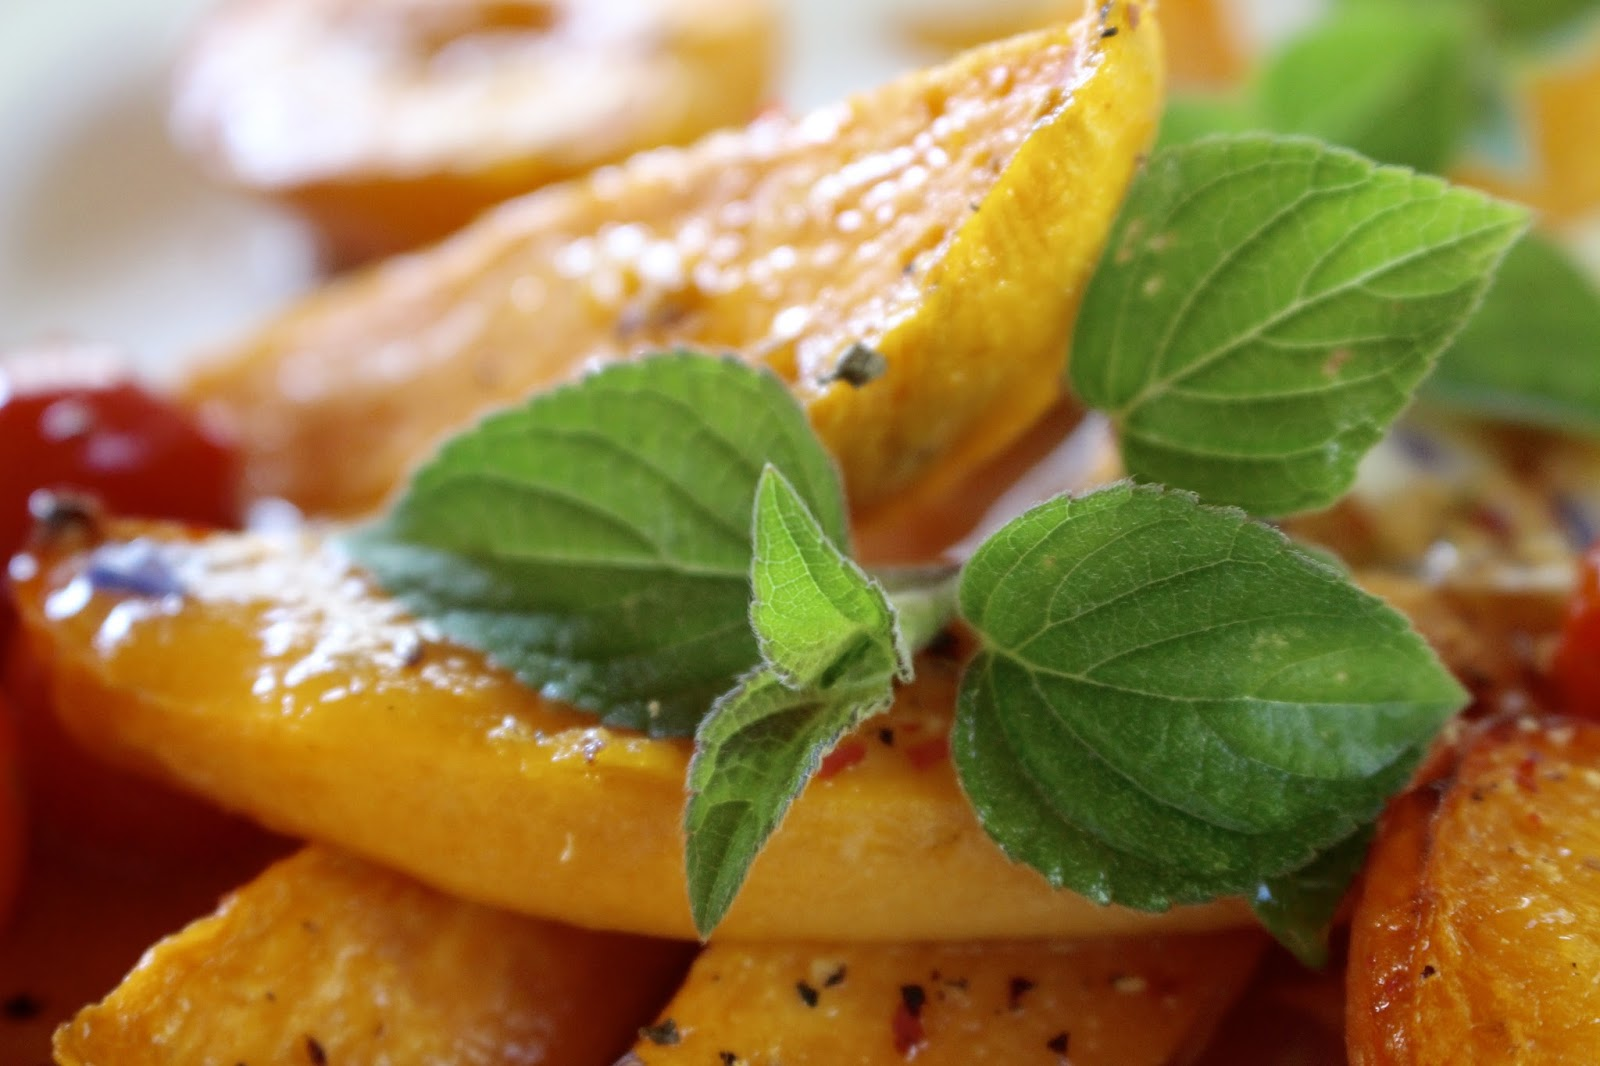 Gebackene Süßkartoffeln mit Aprikosendressing und zitronigem Kohlrabisalat